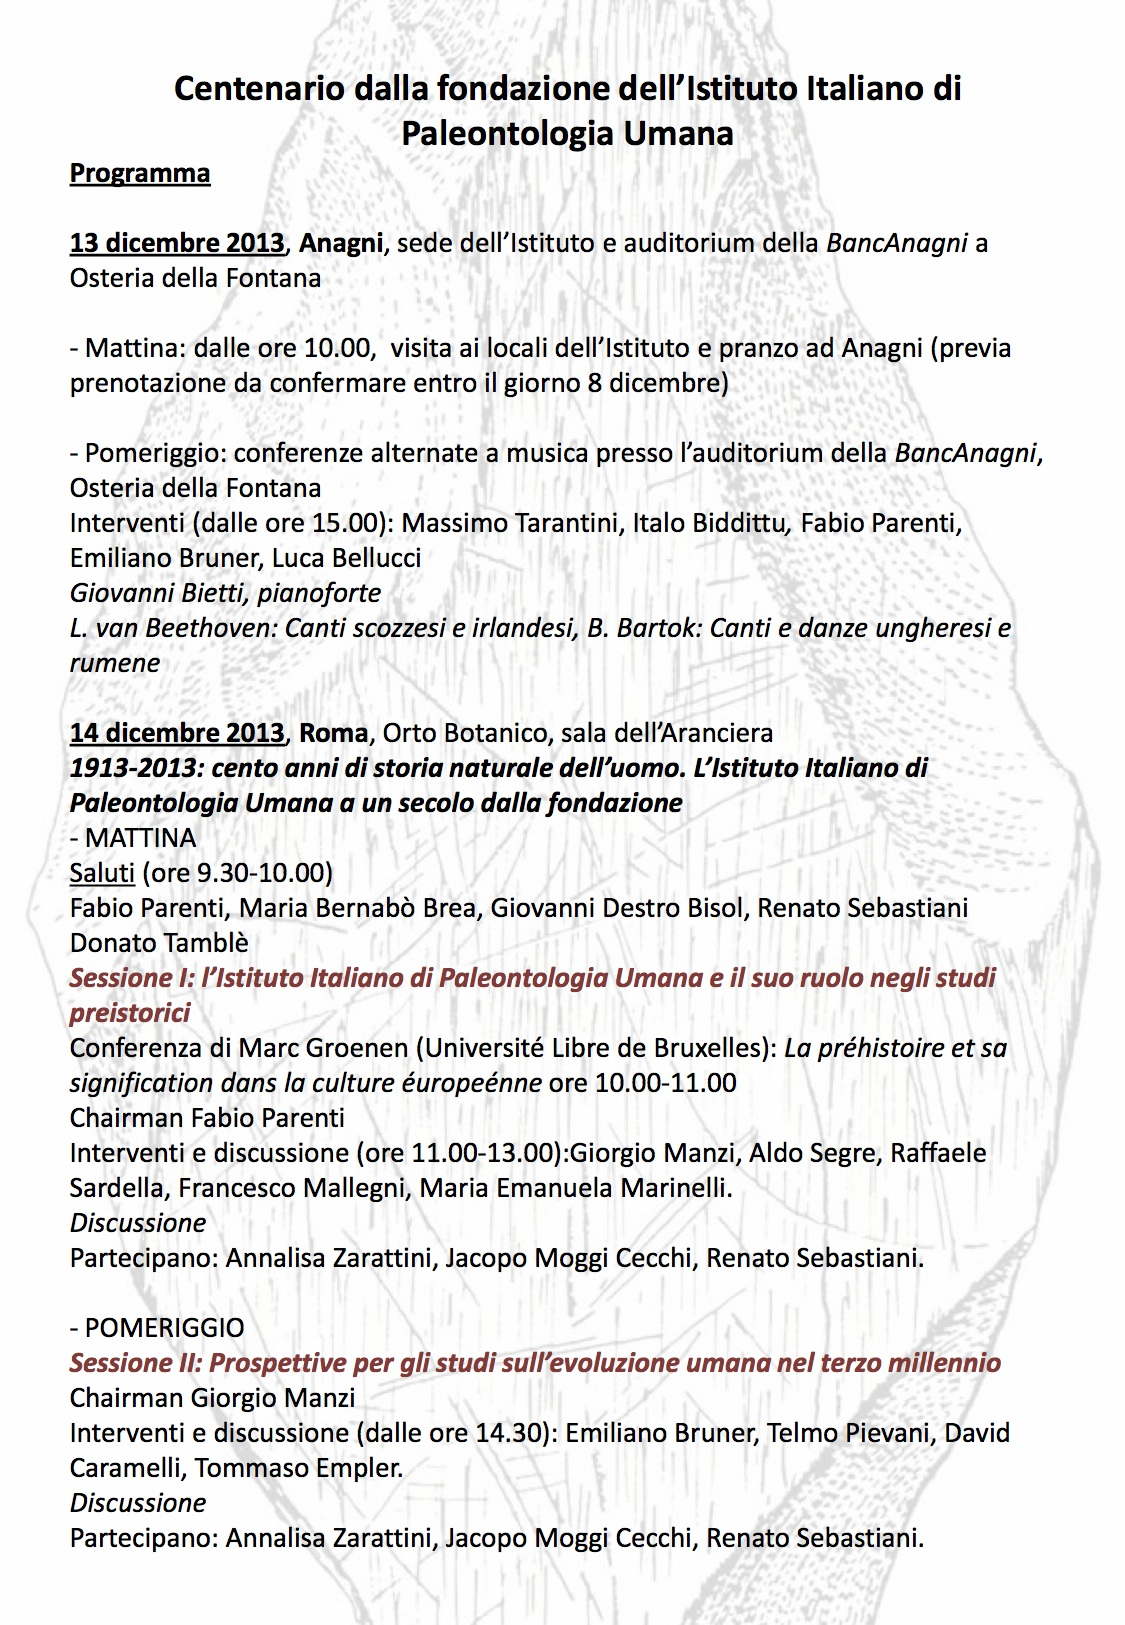 locandina_programma_centenario_IsIPU